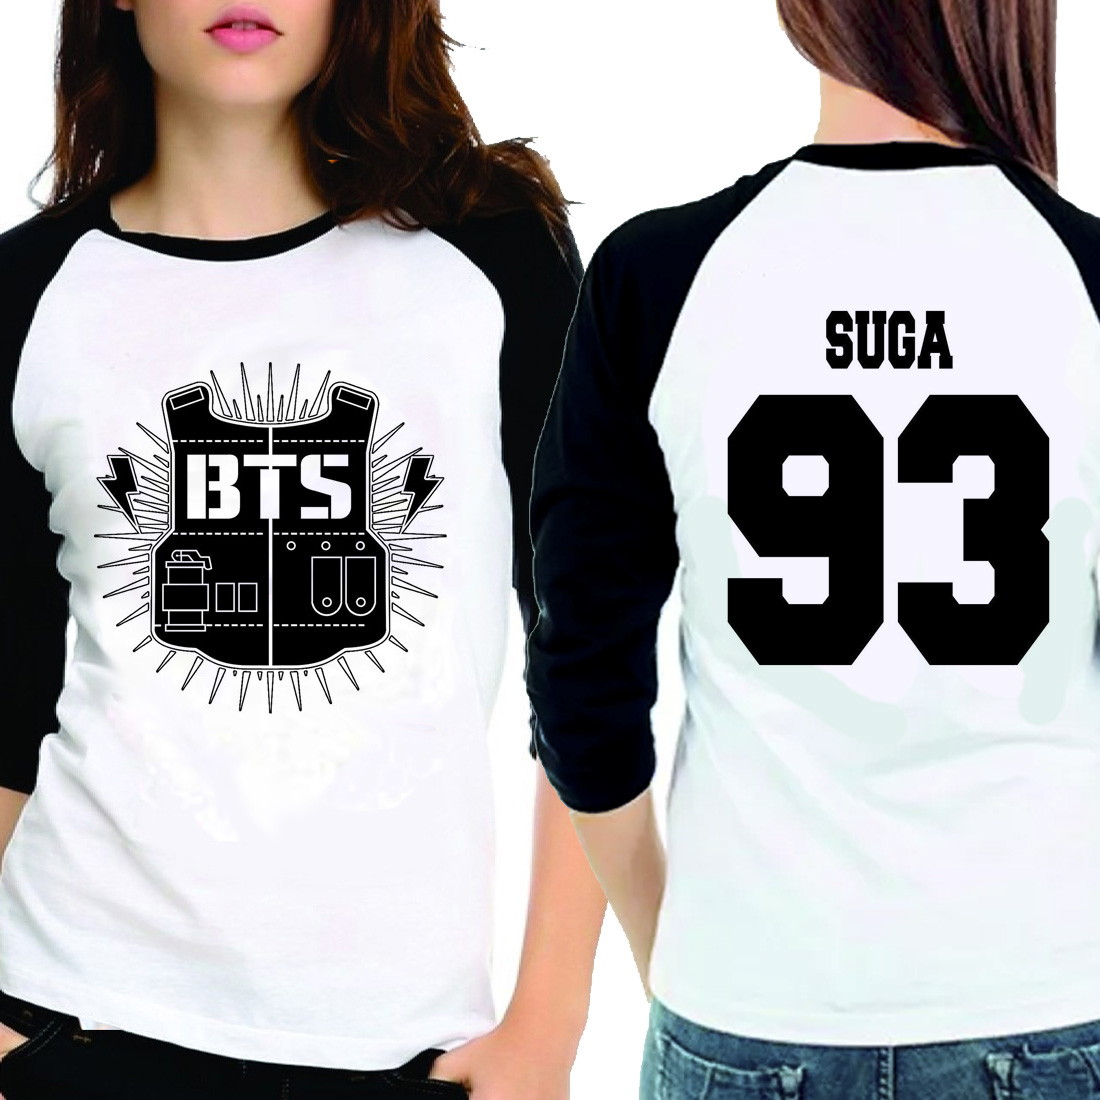 ae742a3eb8857 Camiseta Bangtan Boys Bts Suga 93 3 4 no Elo7